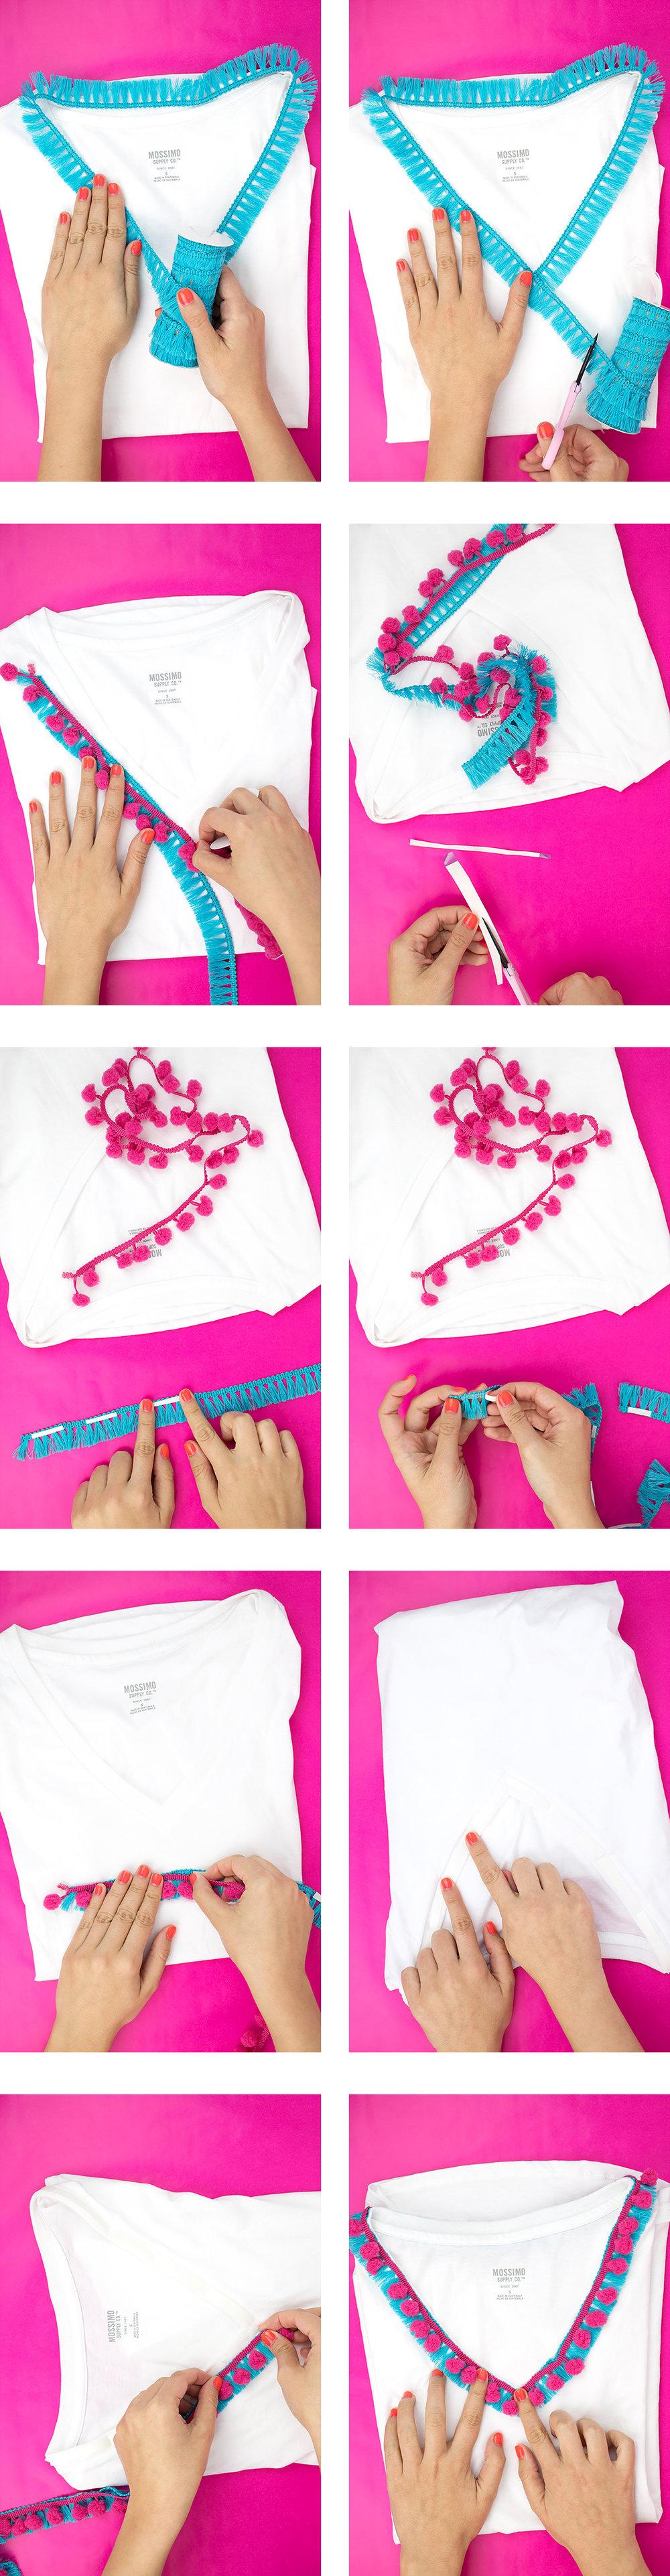 Embellished Tee Collage.jpg